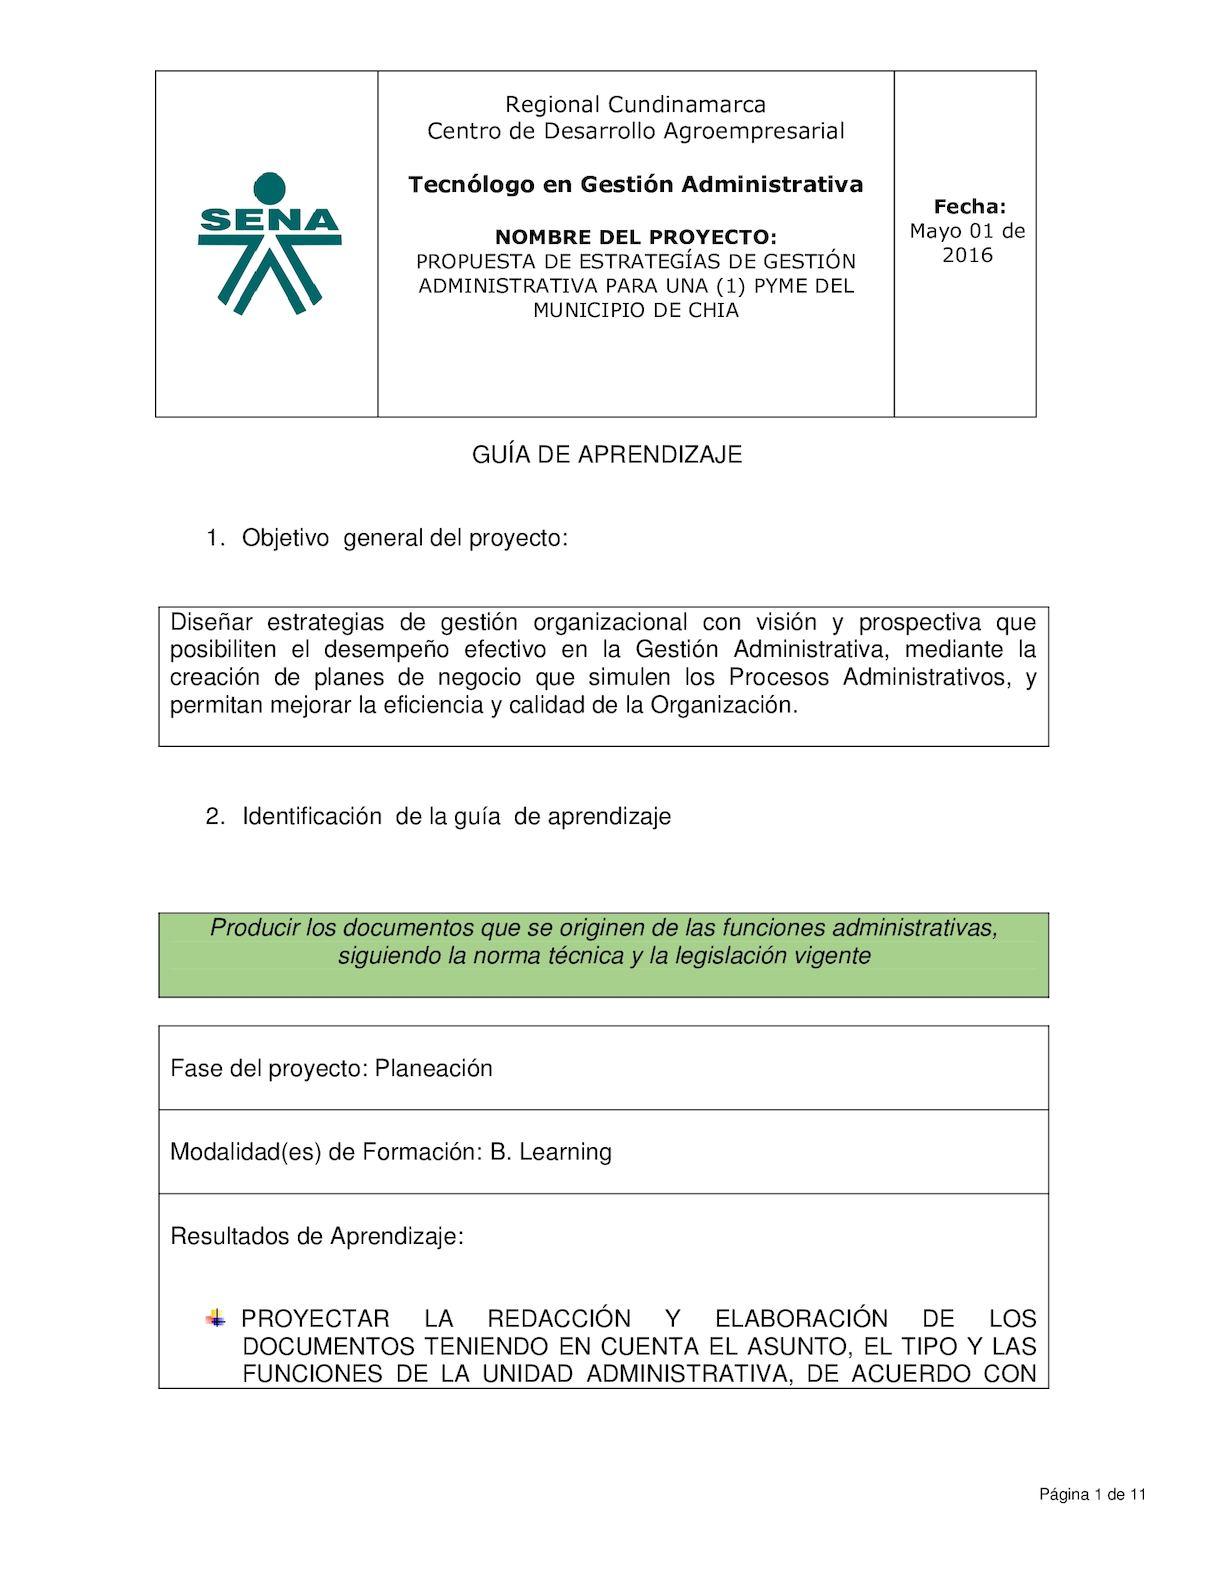 Guias Producir Documentos (2)